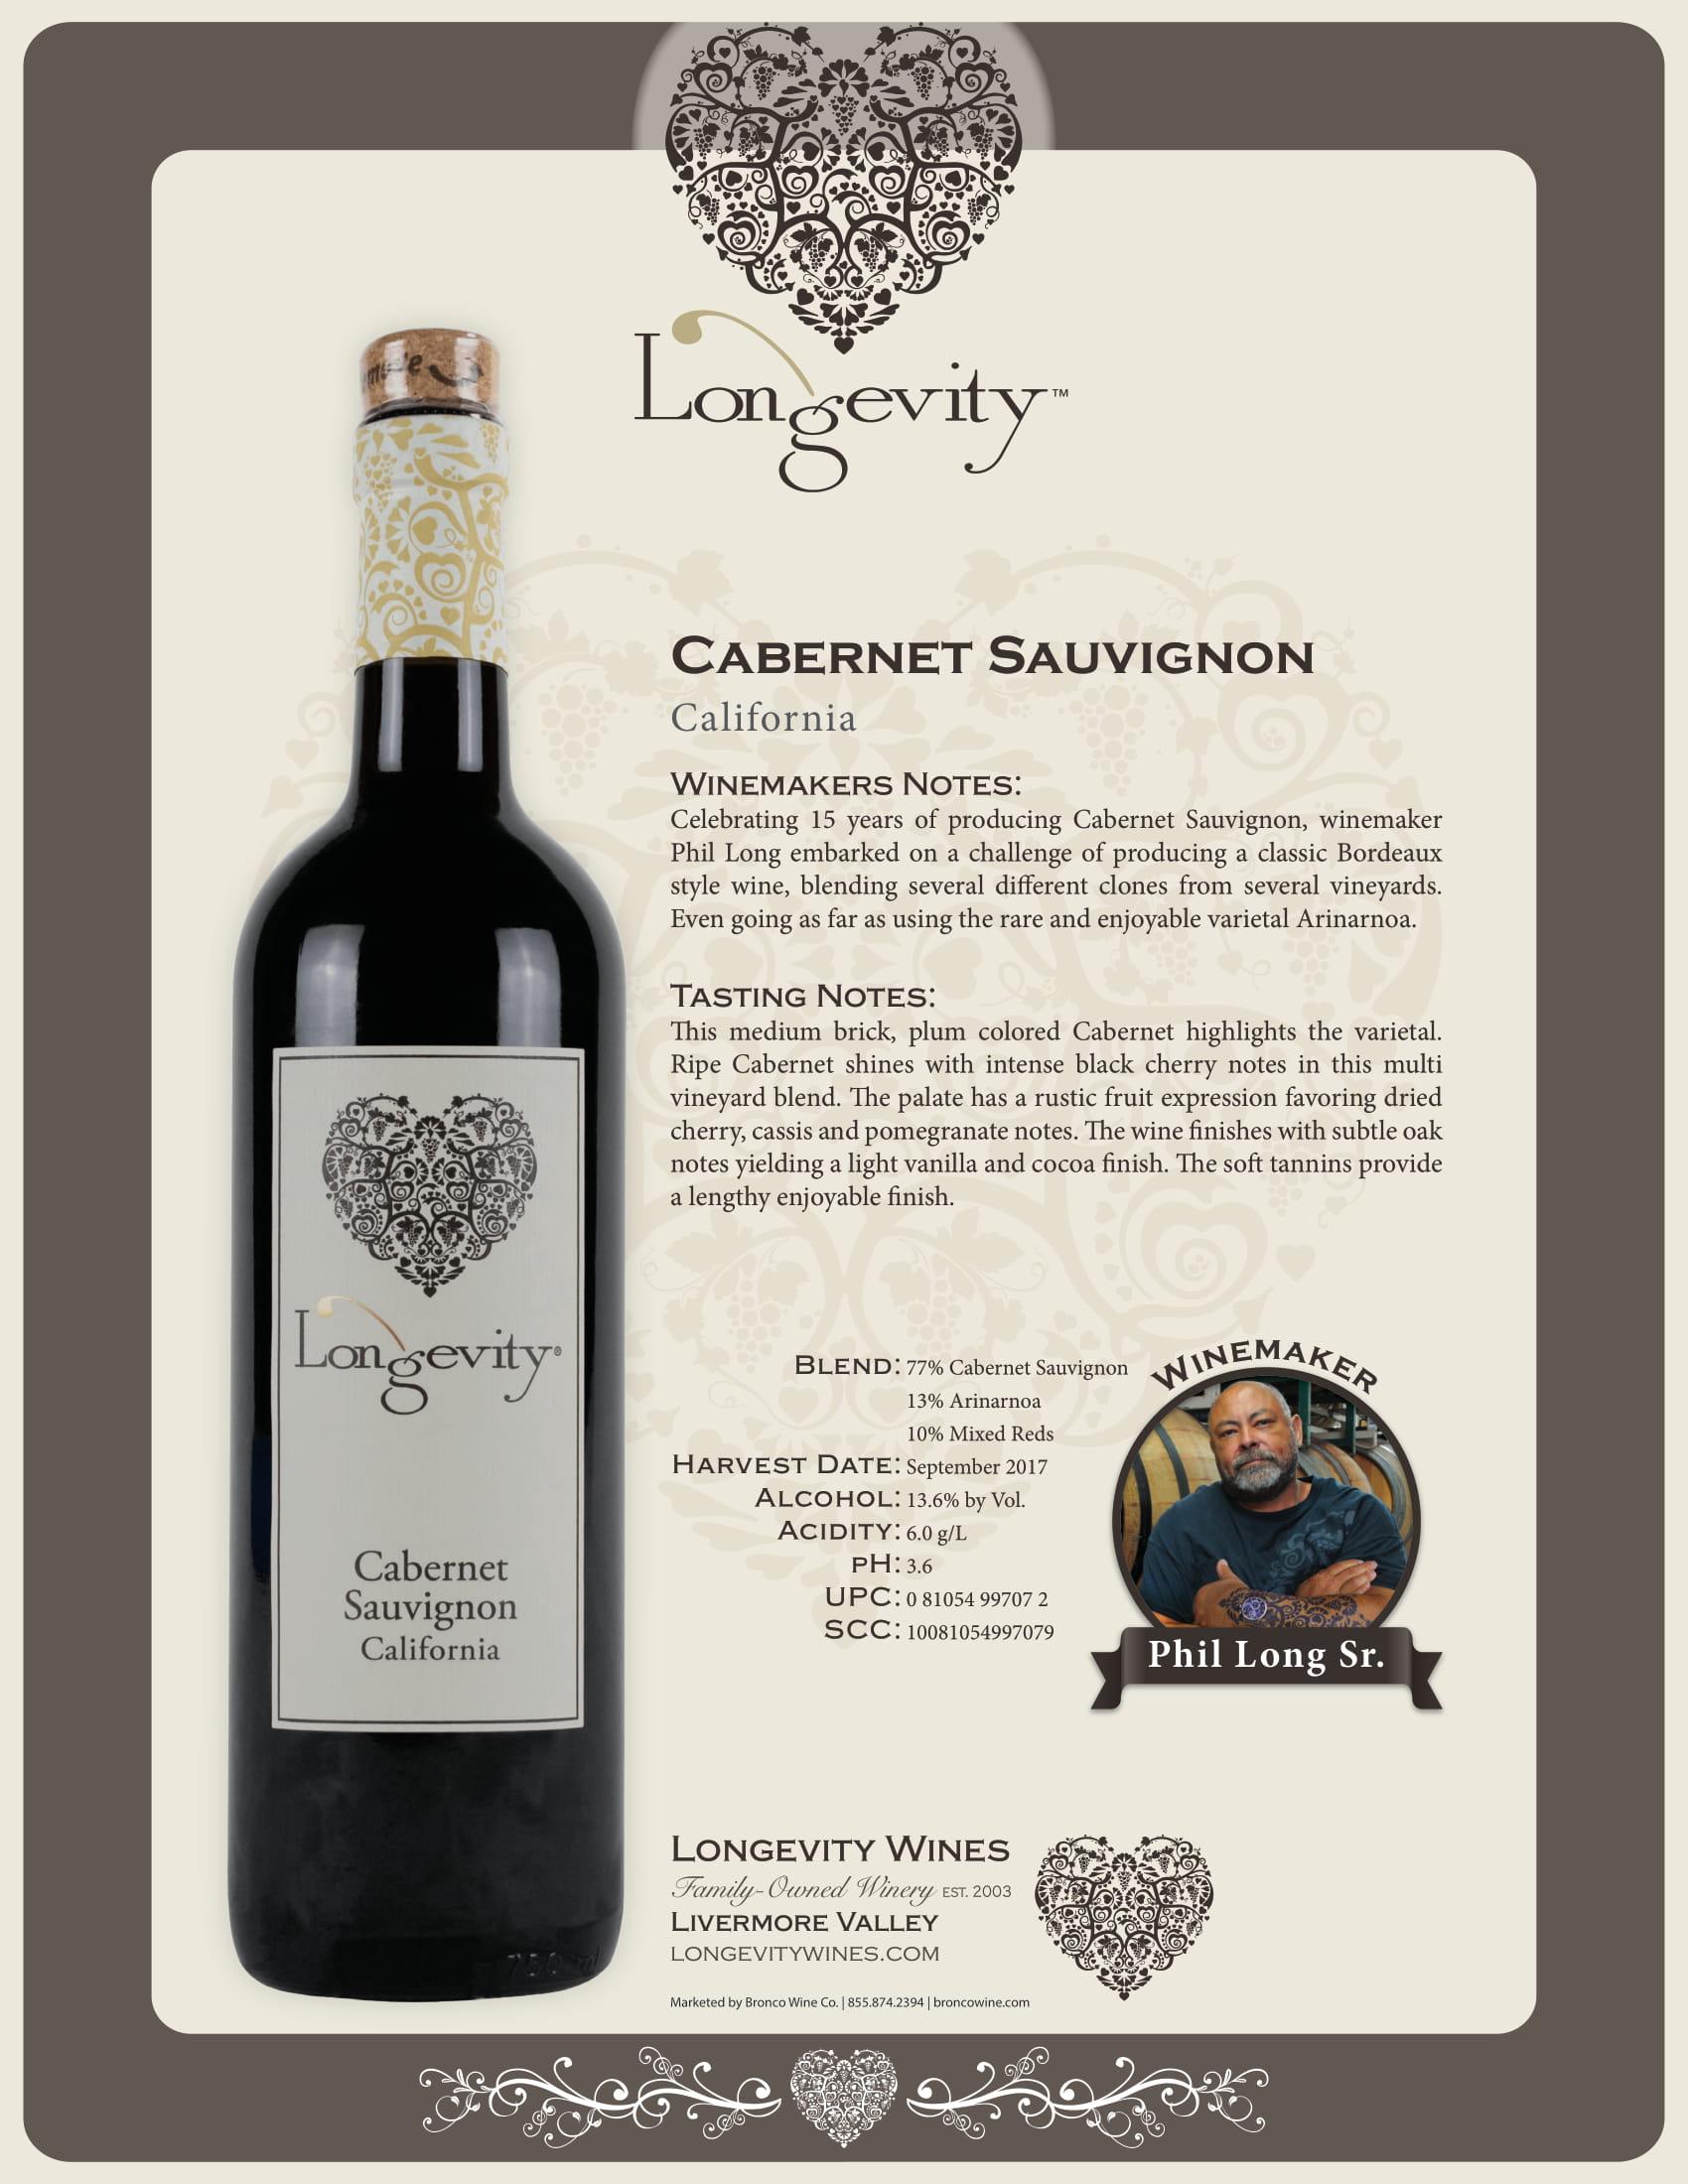 Longevity Cabernet Sauvignon Tech Sheet